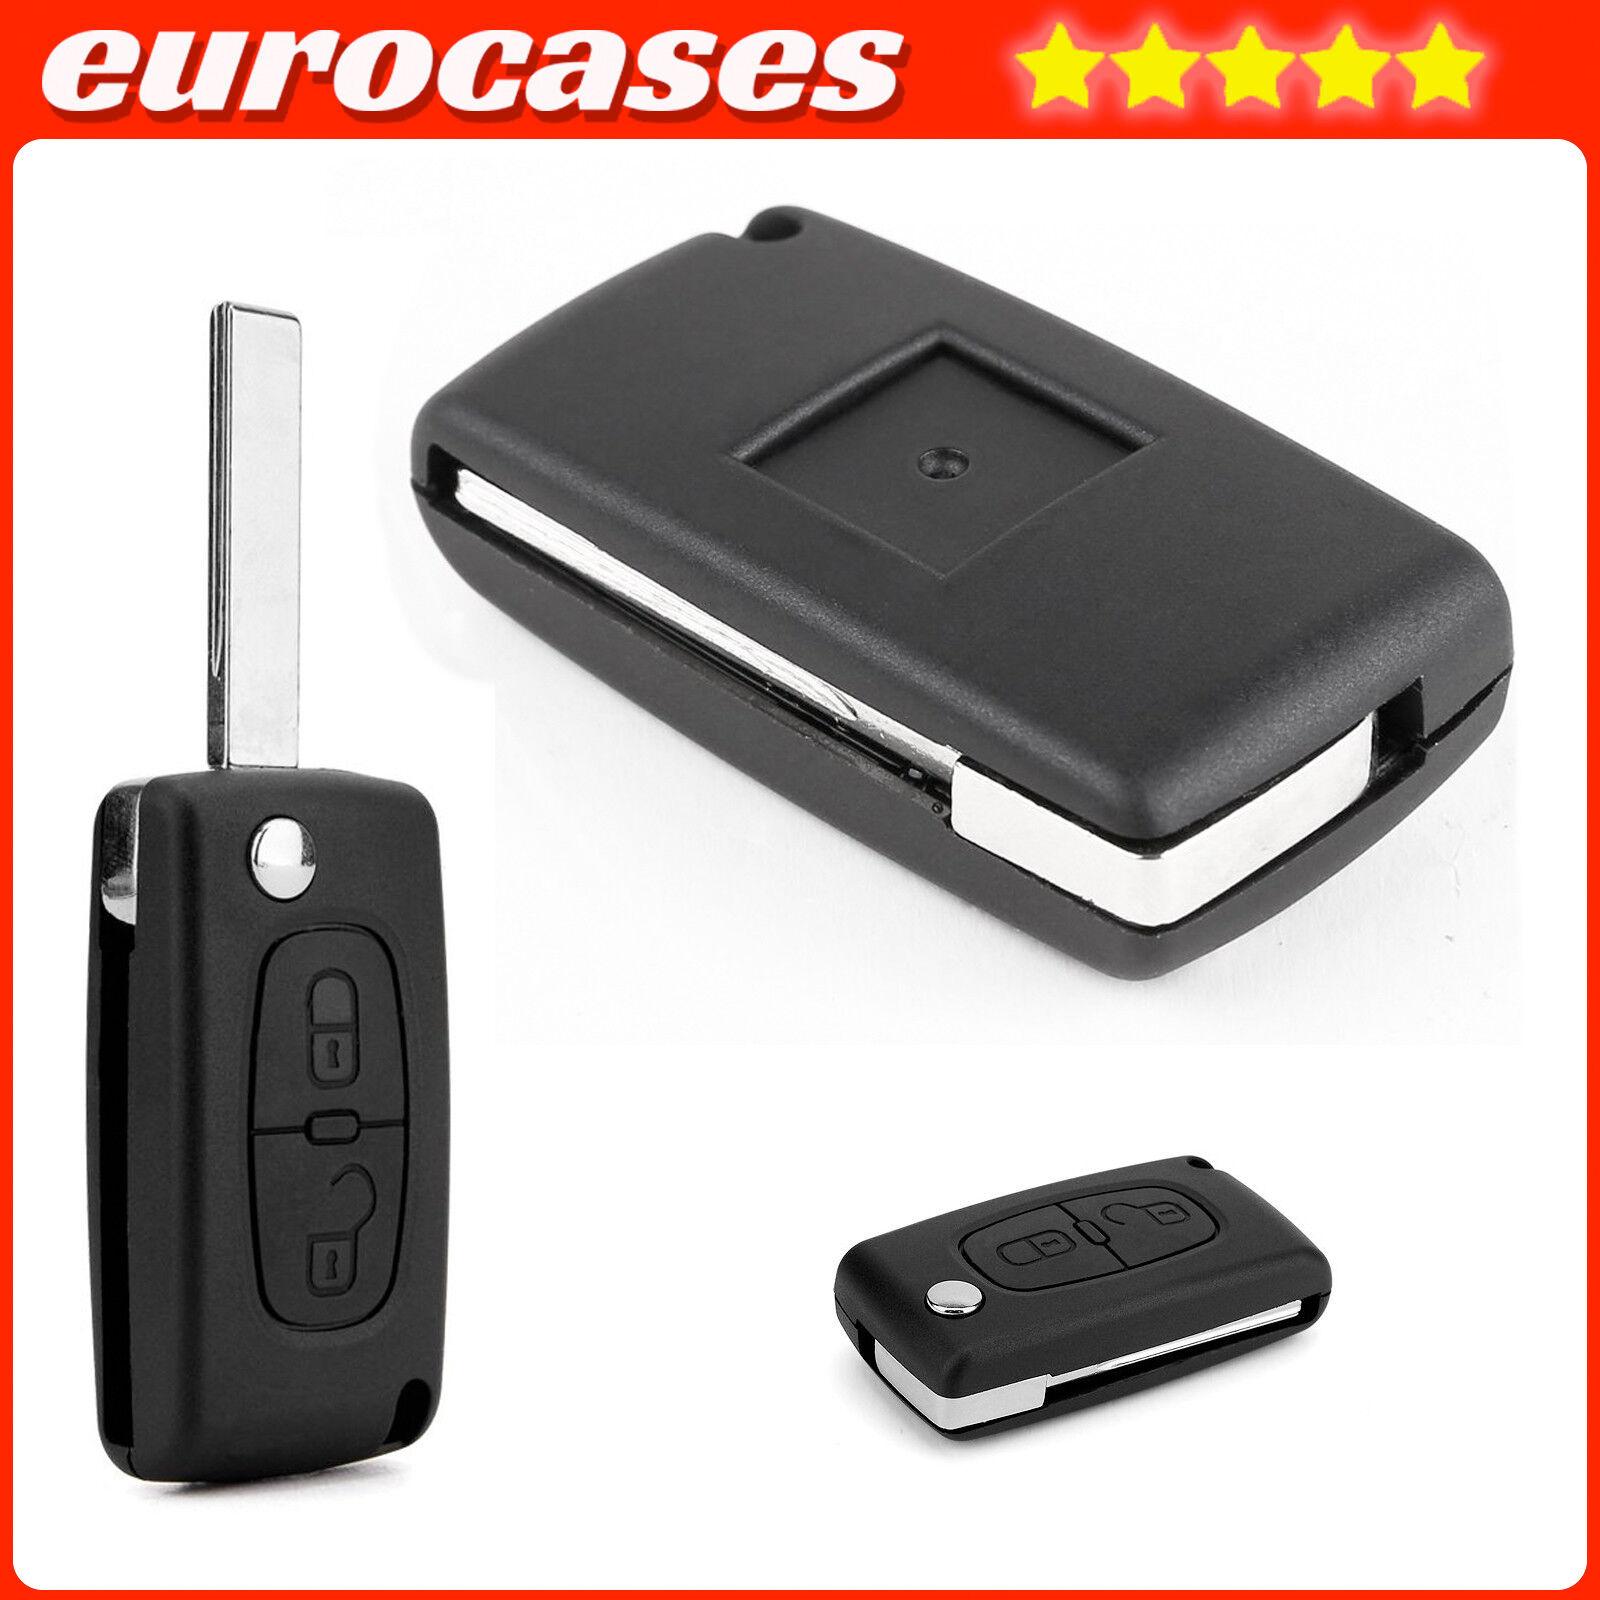 2 Botón Llave Carcasa Flip-Shell Para Peugeot 807 3008 5008 experto PEU03